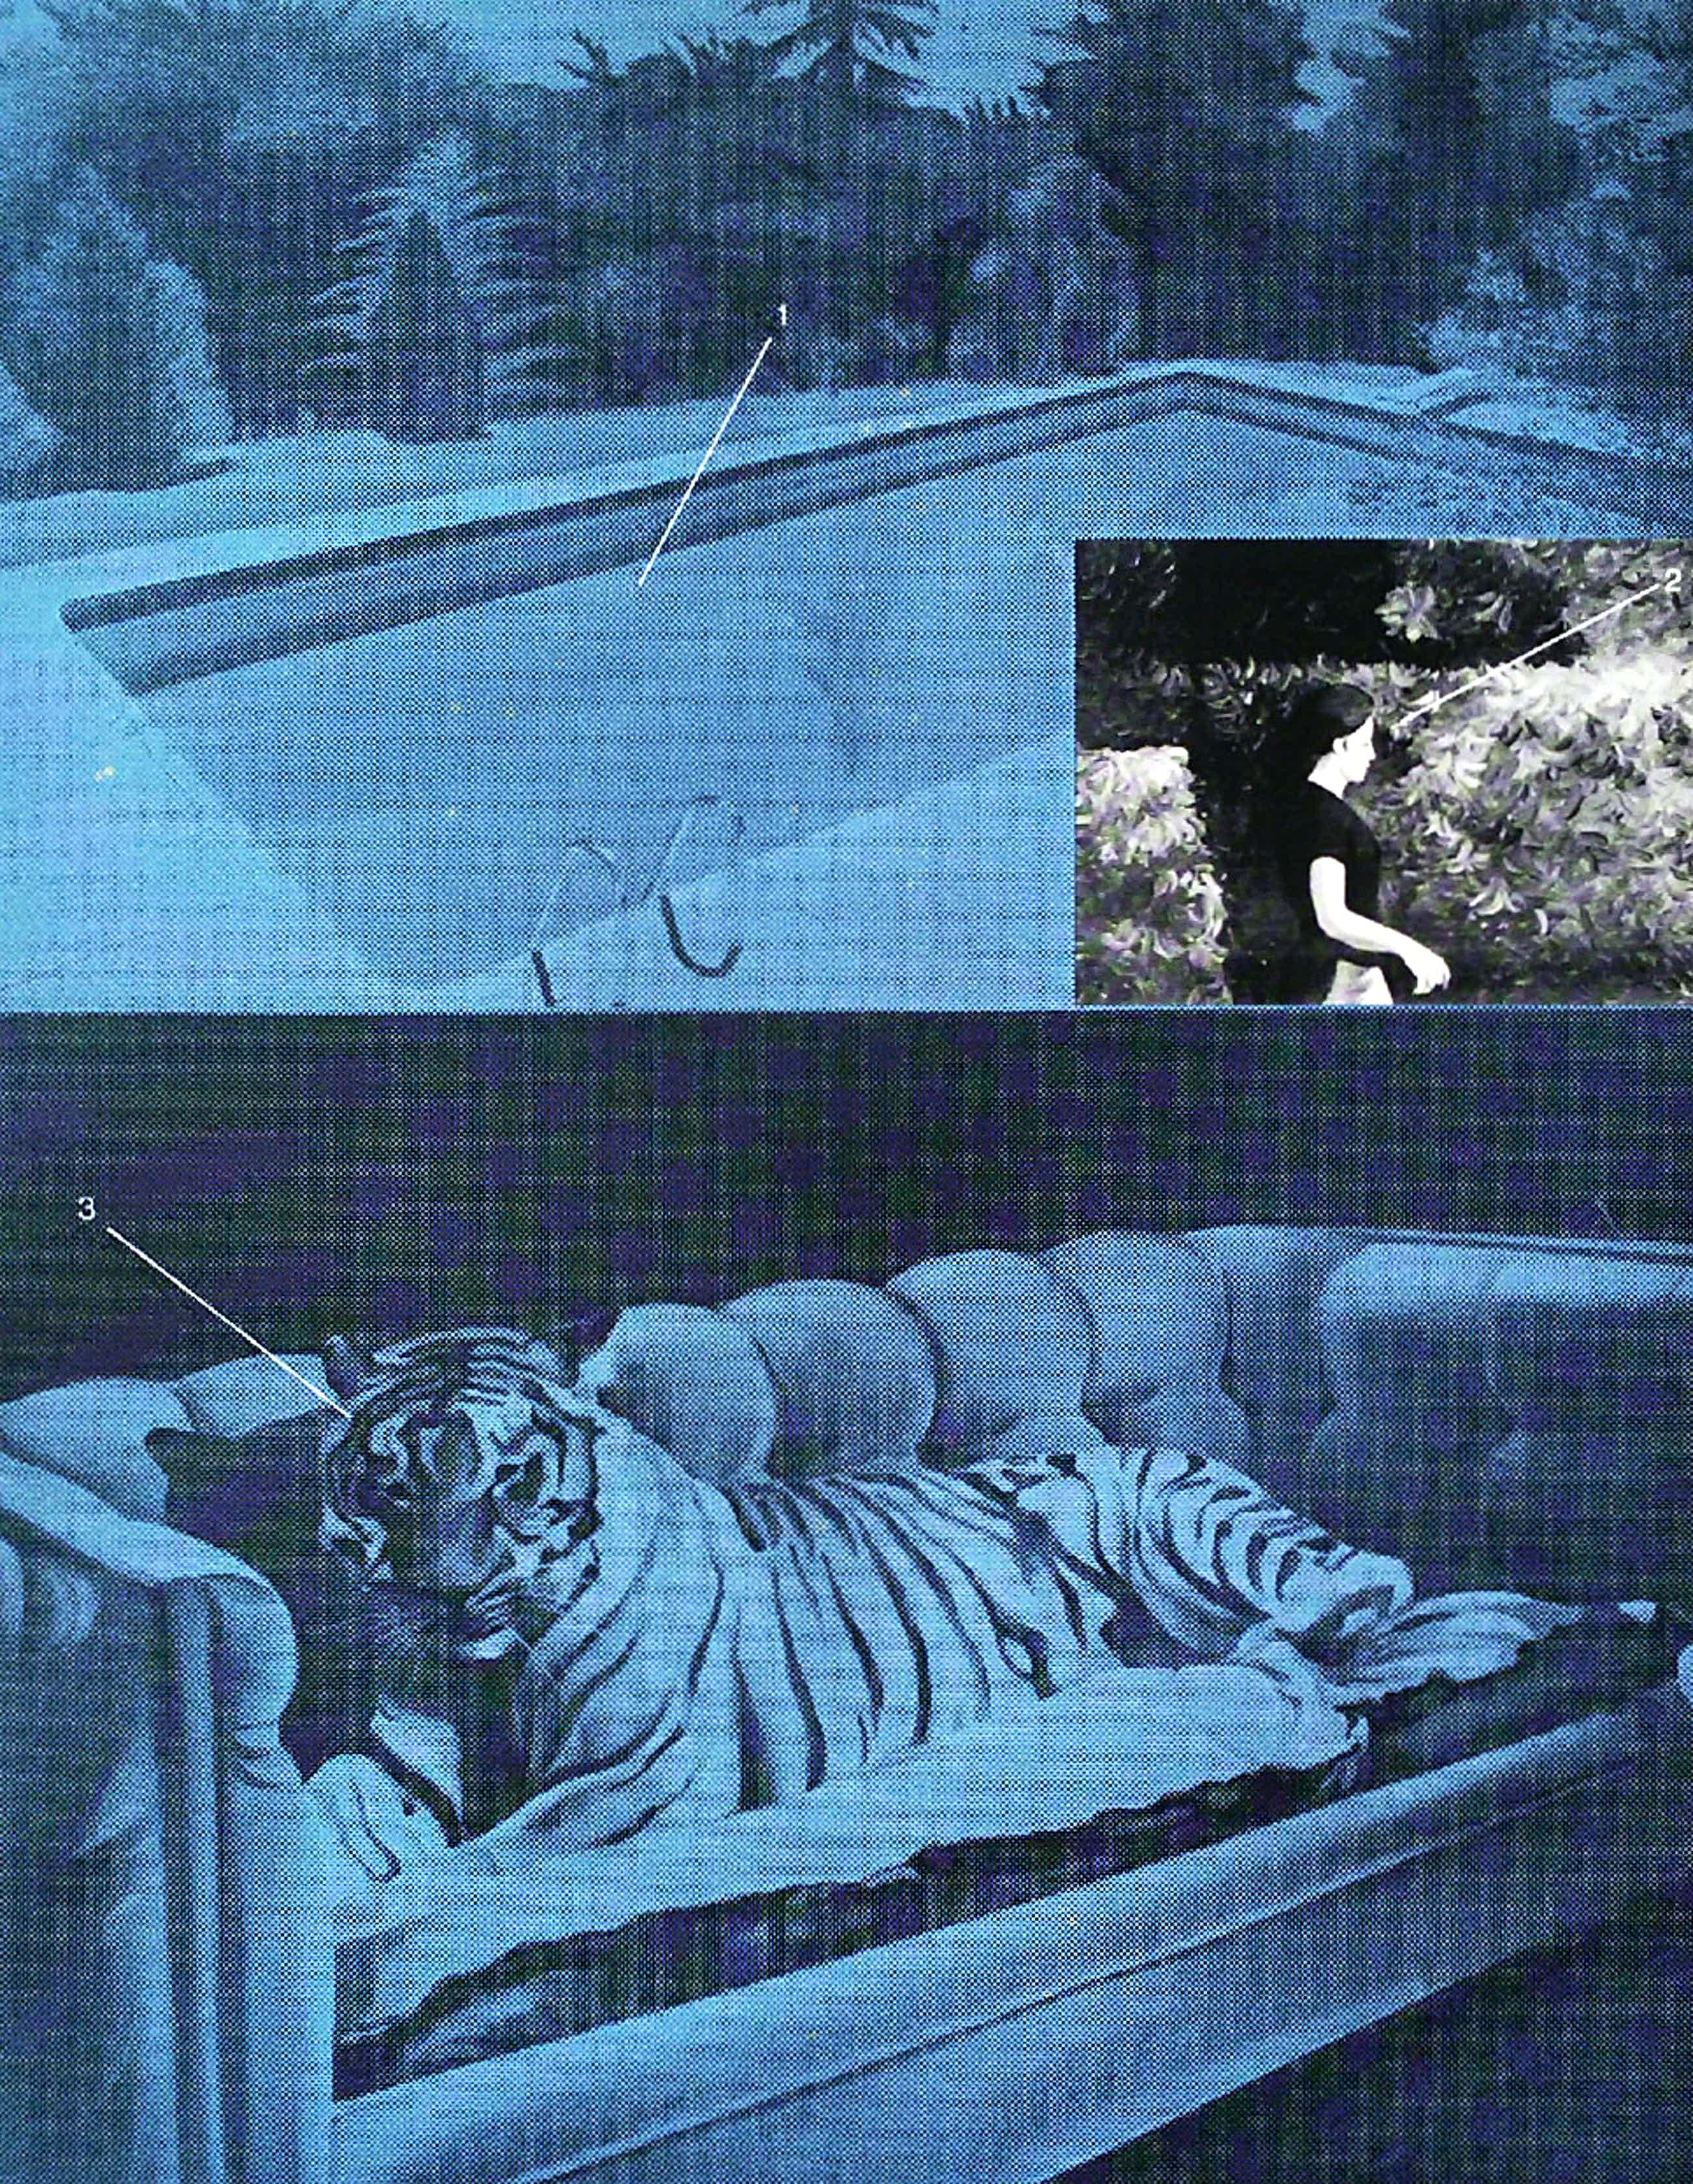 Jacques Monory - Tigre sur fond bleu, zeefdruk kopen? Bied vanaf 30!